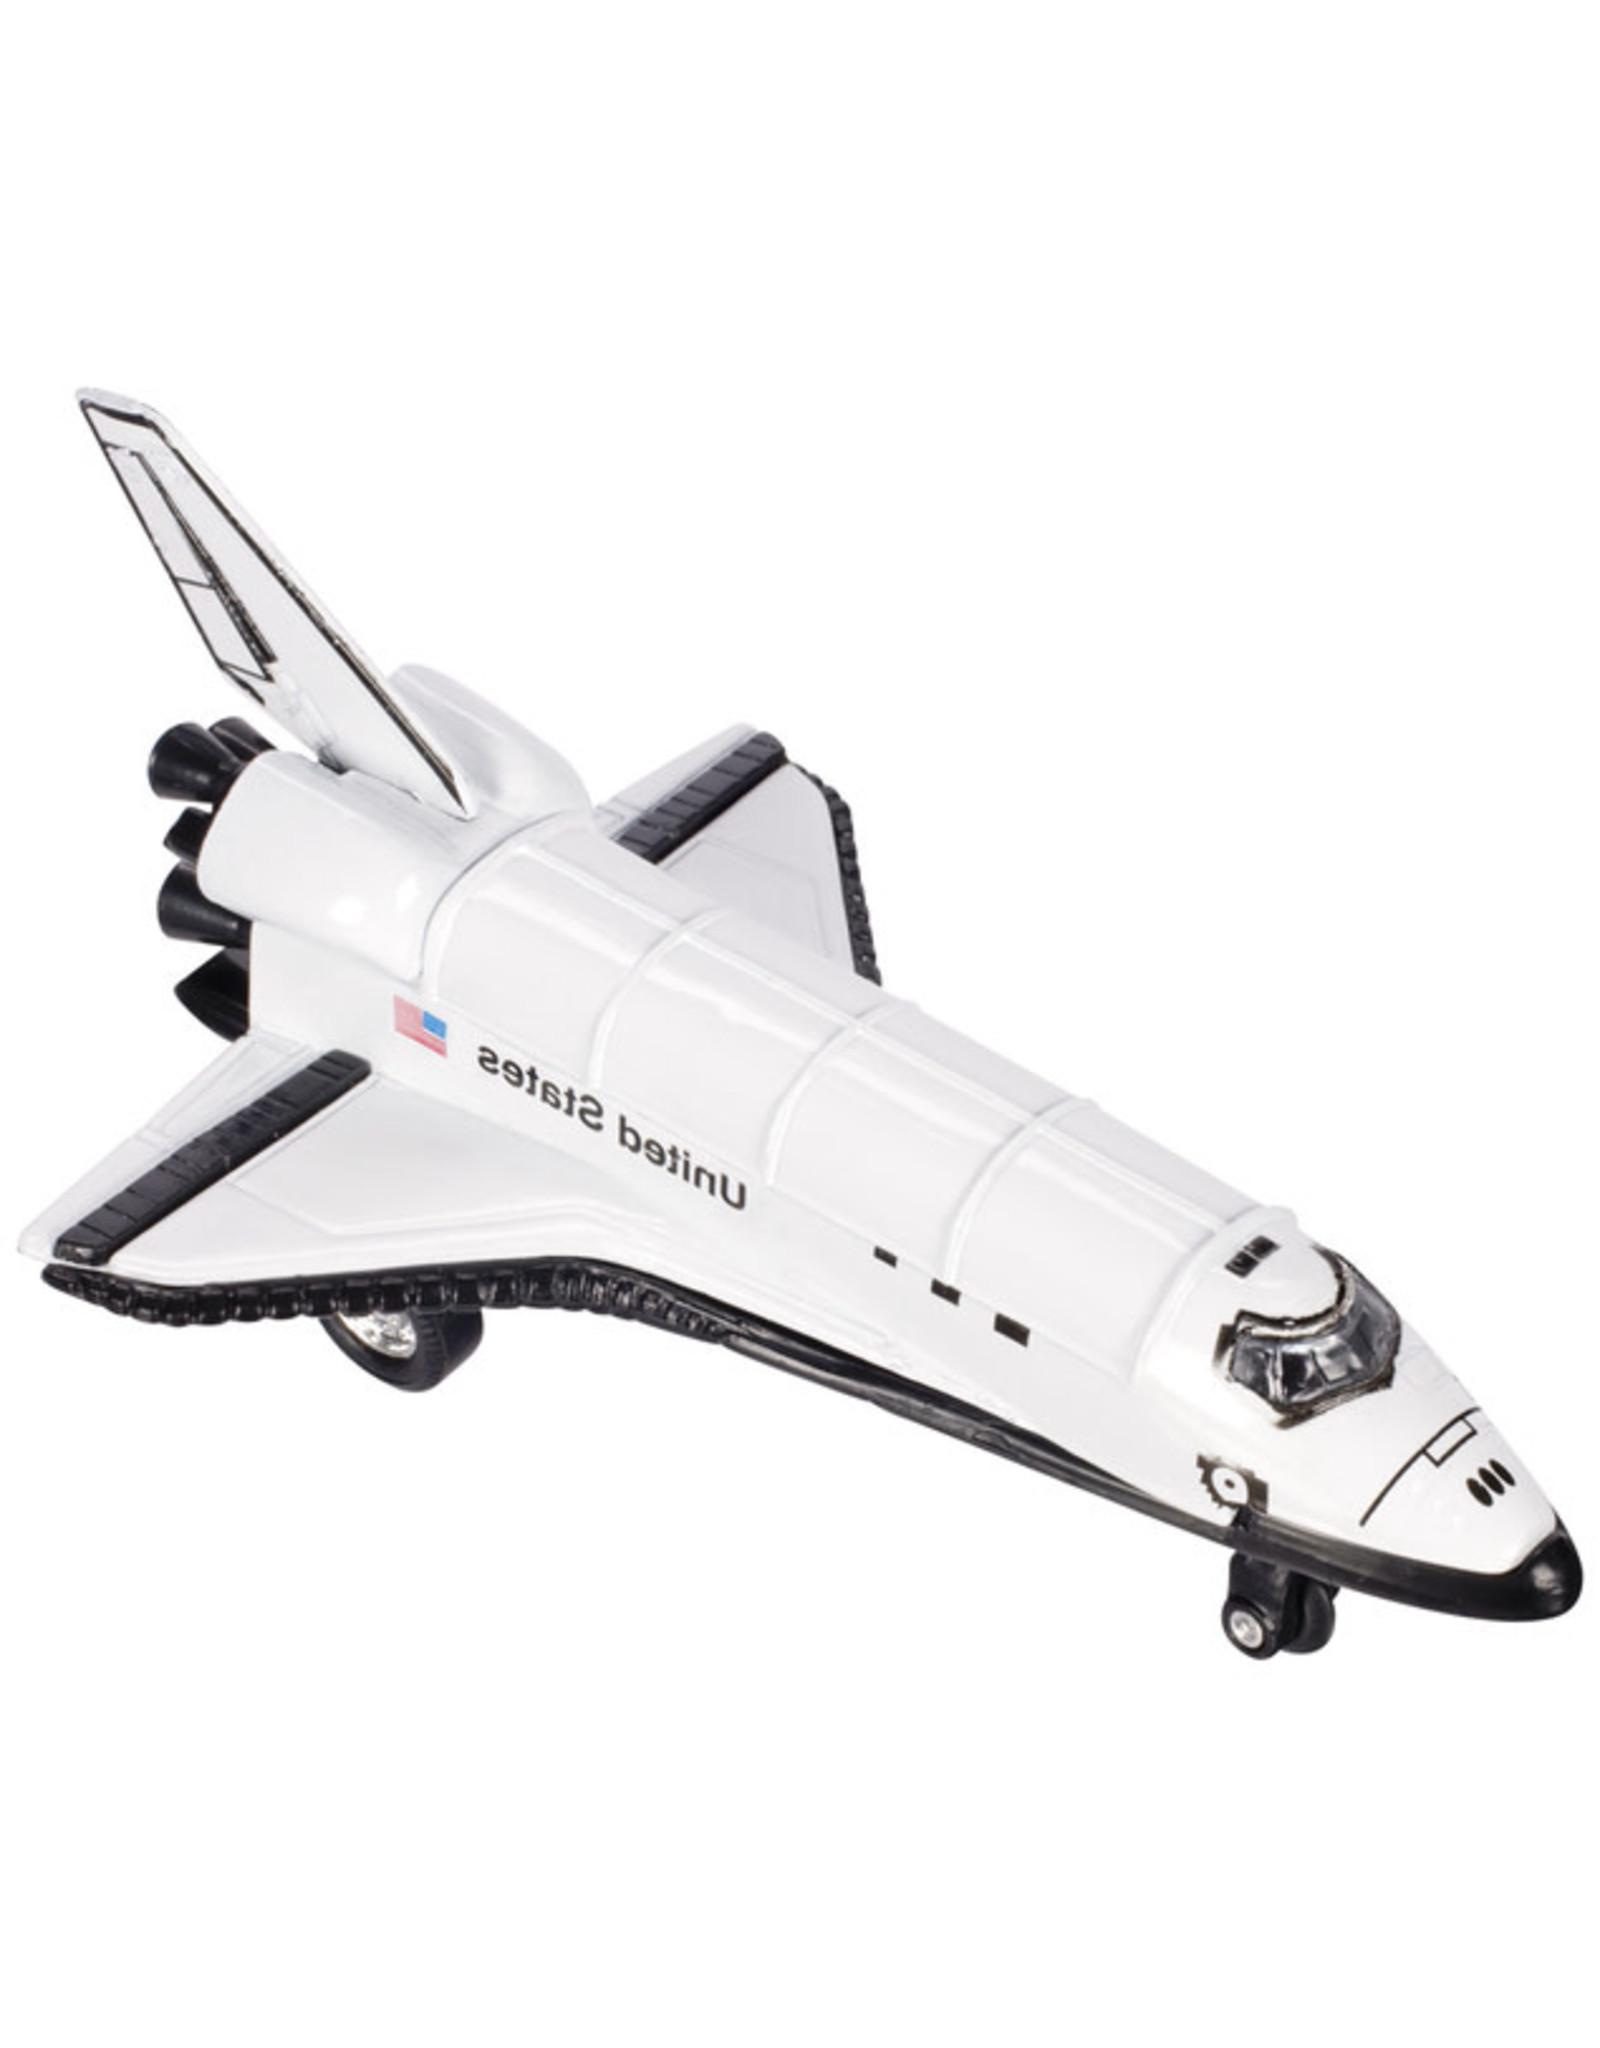 Space Shuttle - pull back